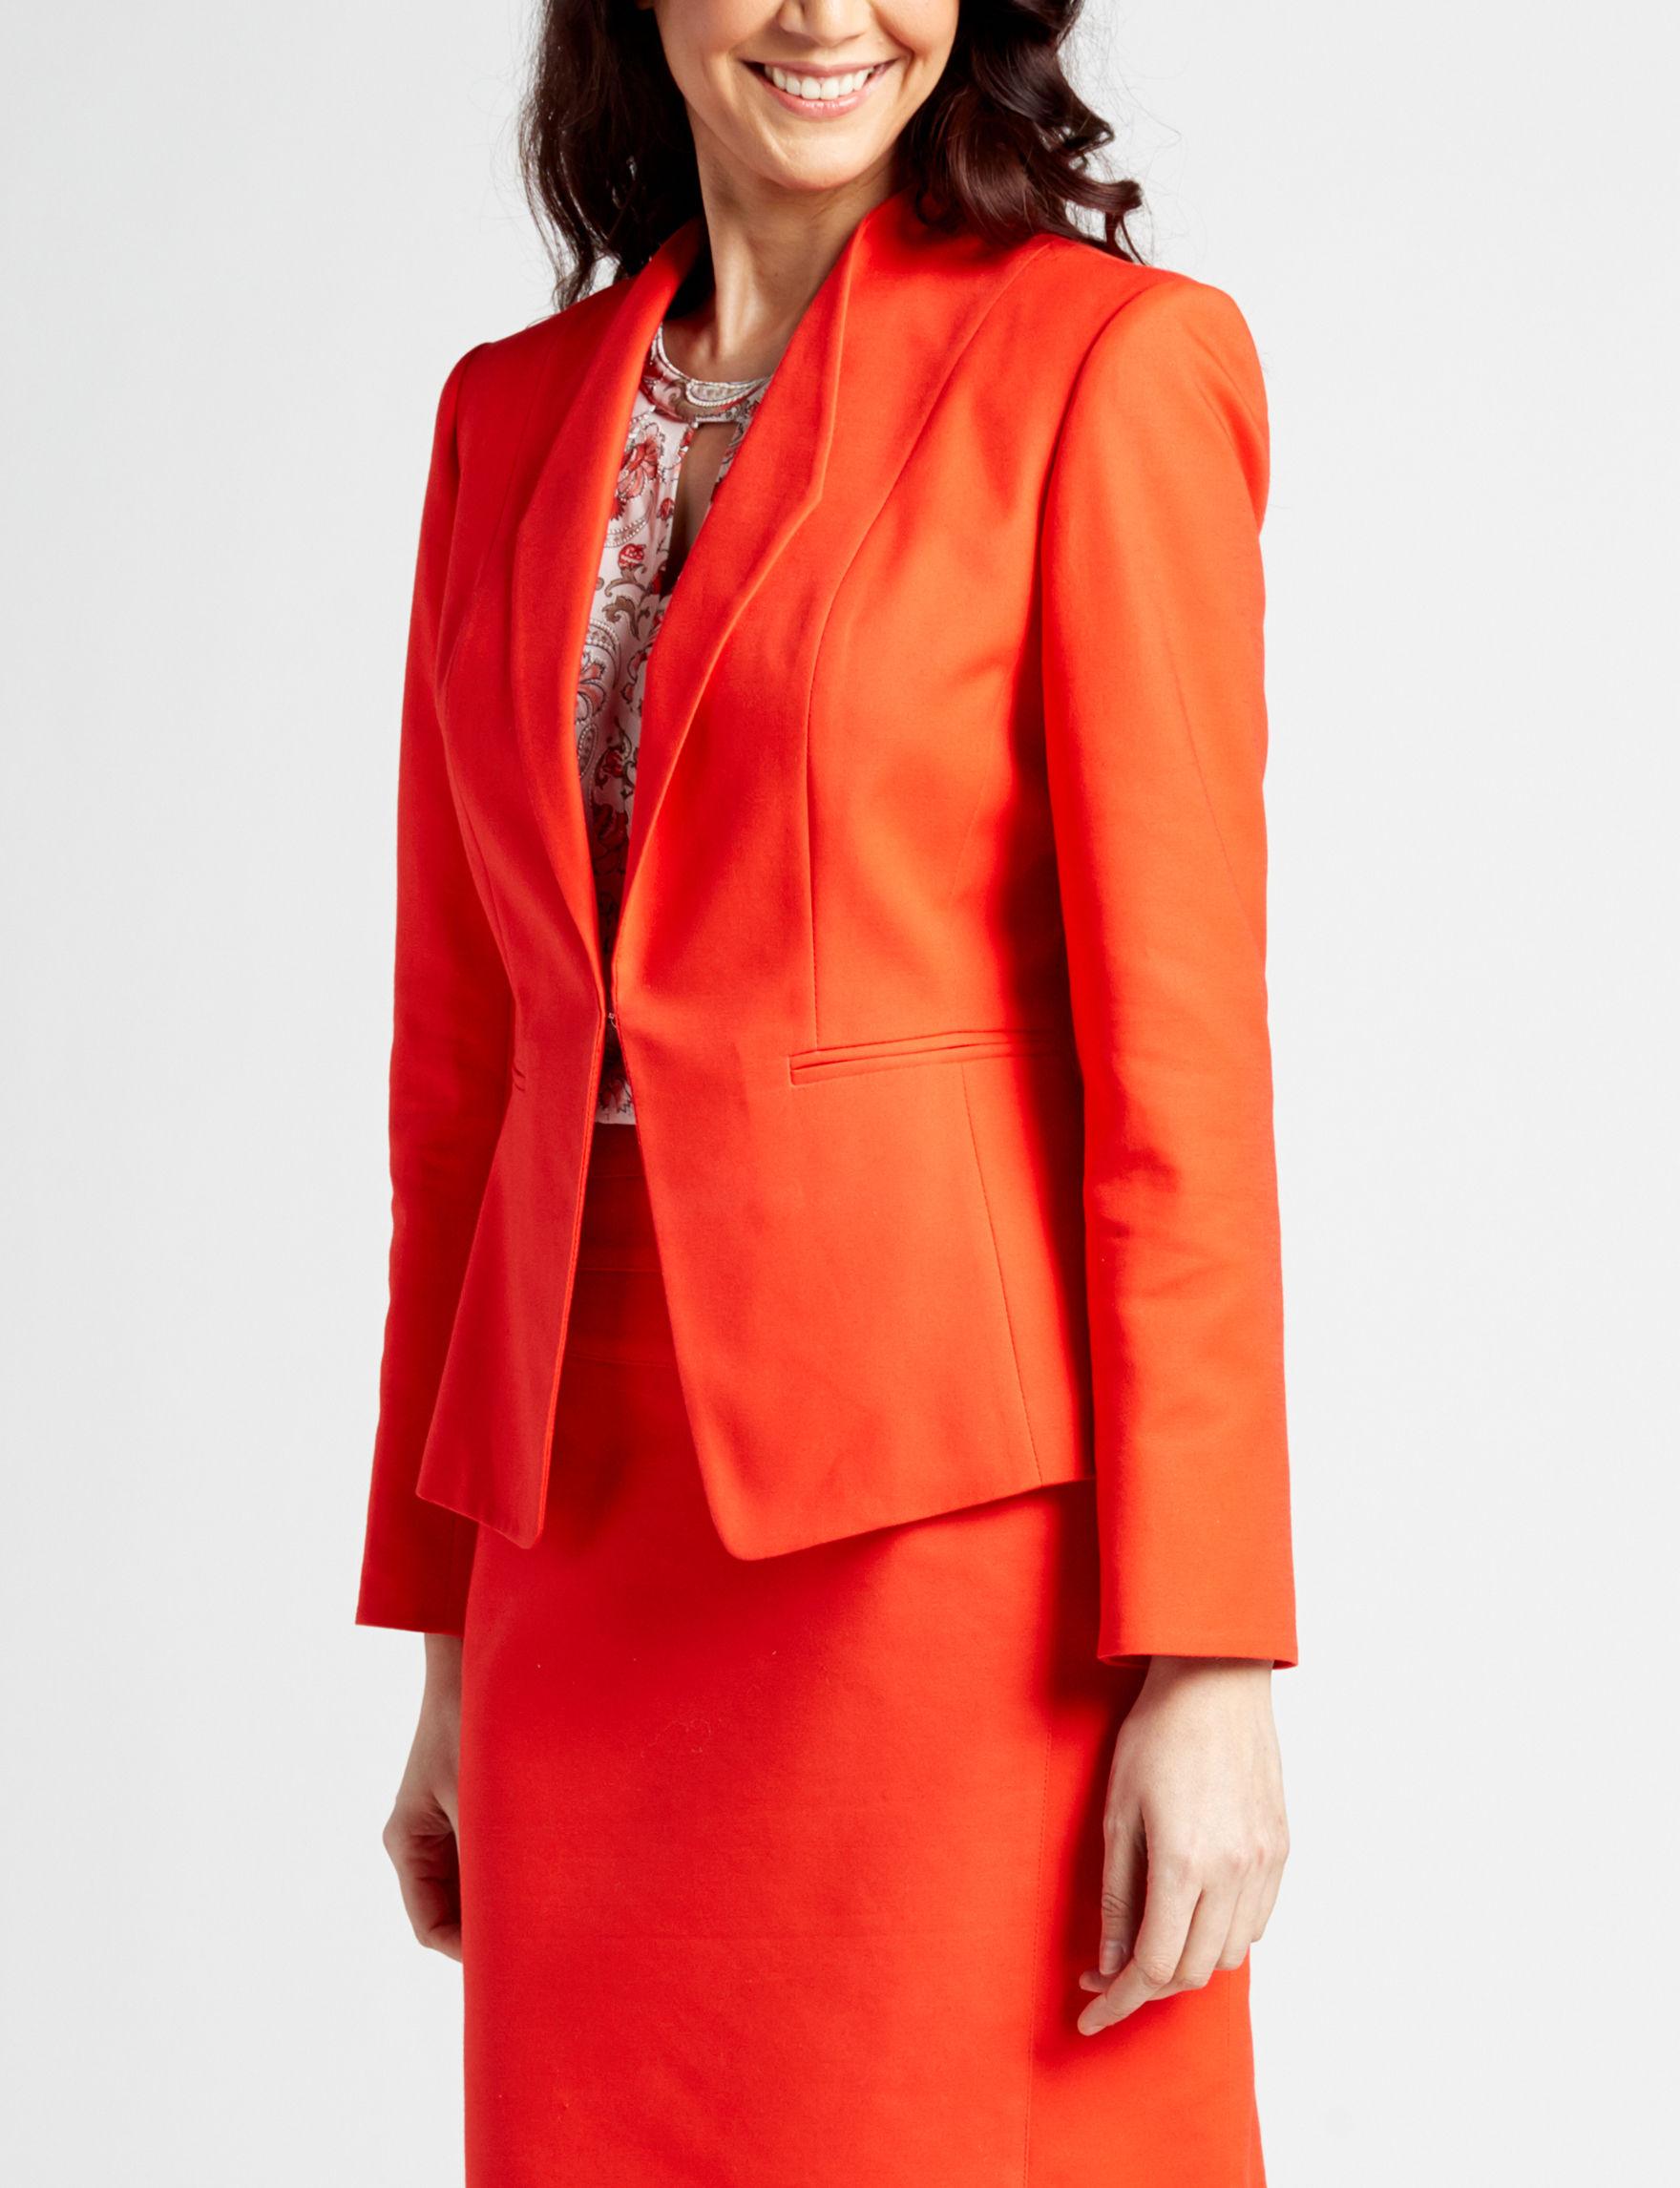 JM Studio Coral Lightweight Jackets & Blazers